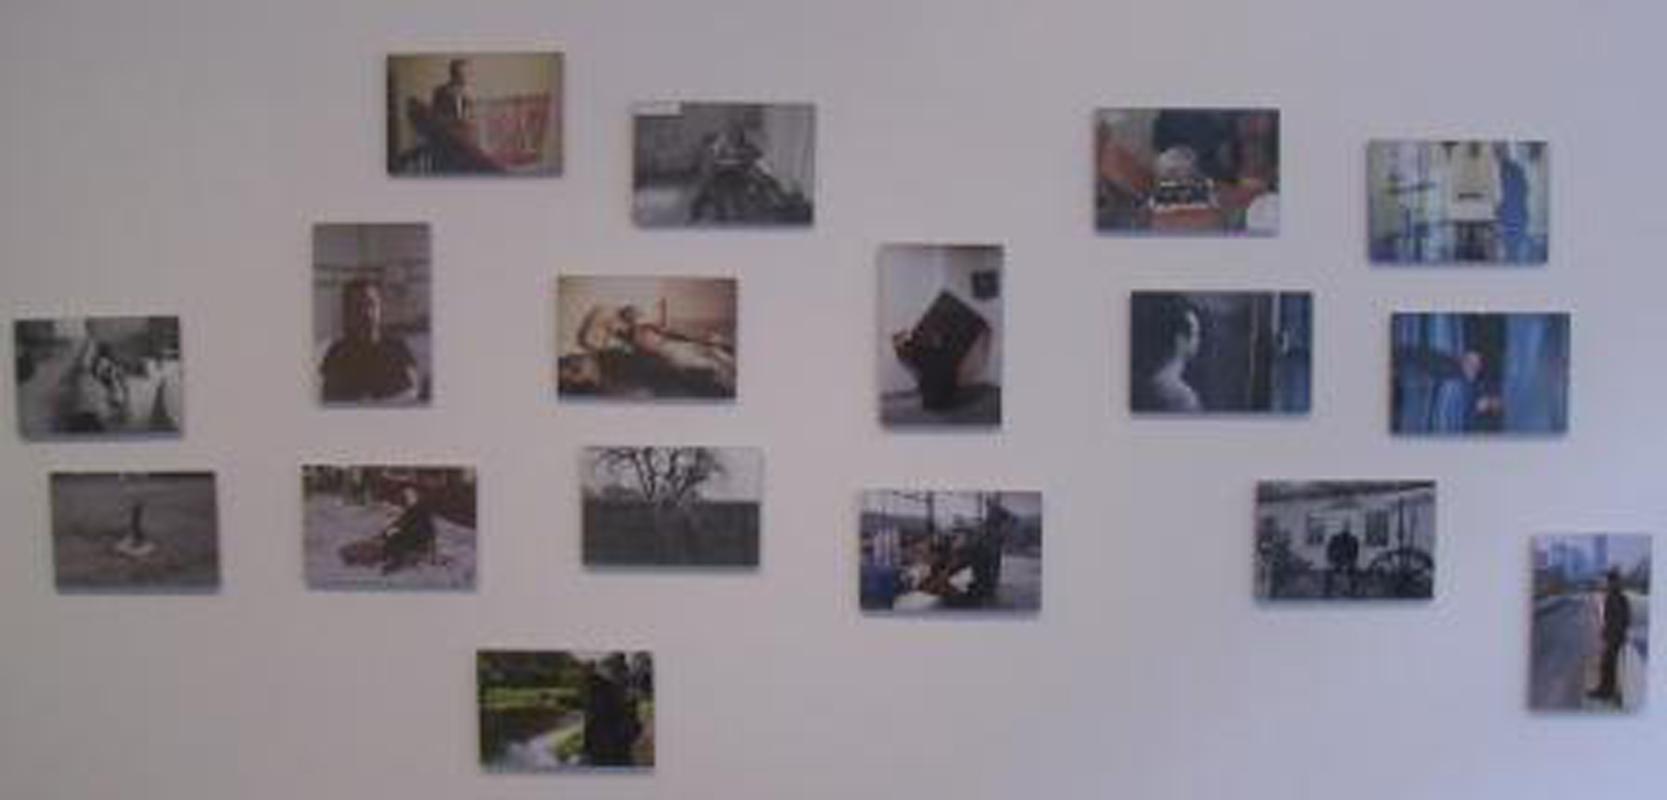 Fein Küche Galerie New London Ct Galerie - Küche Set Ideen ...